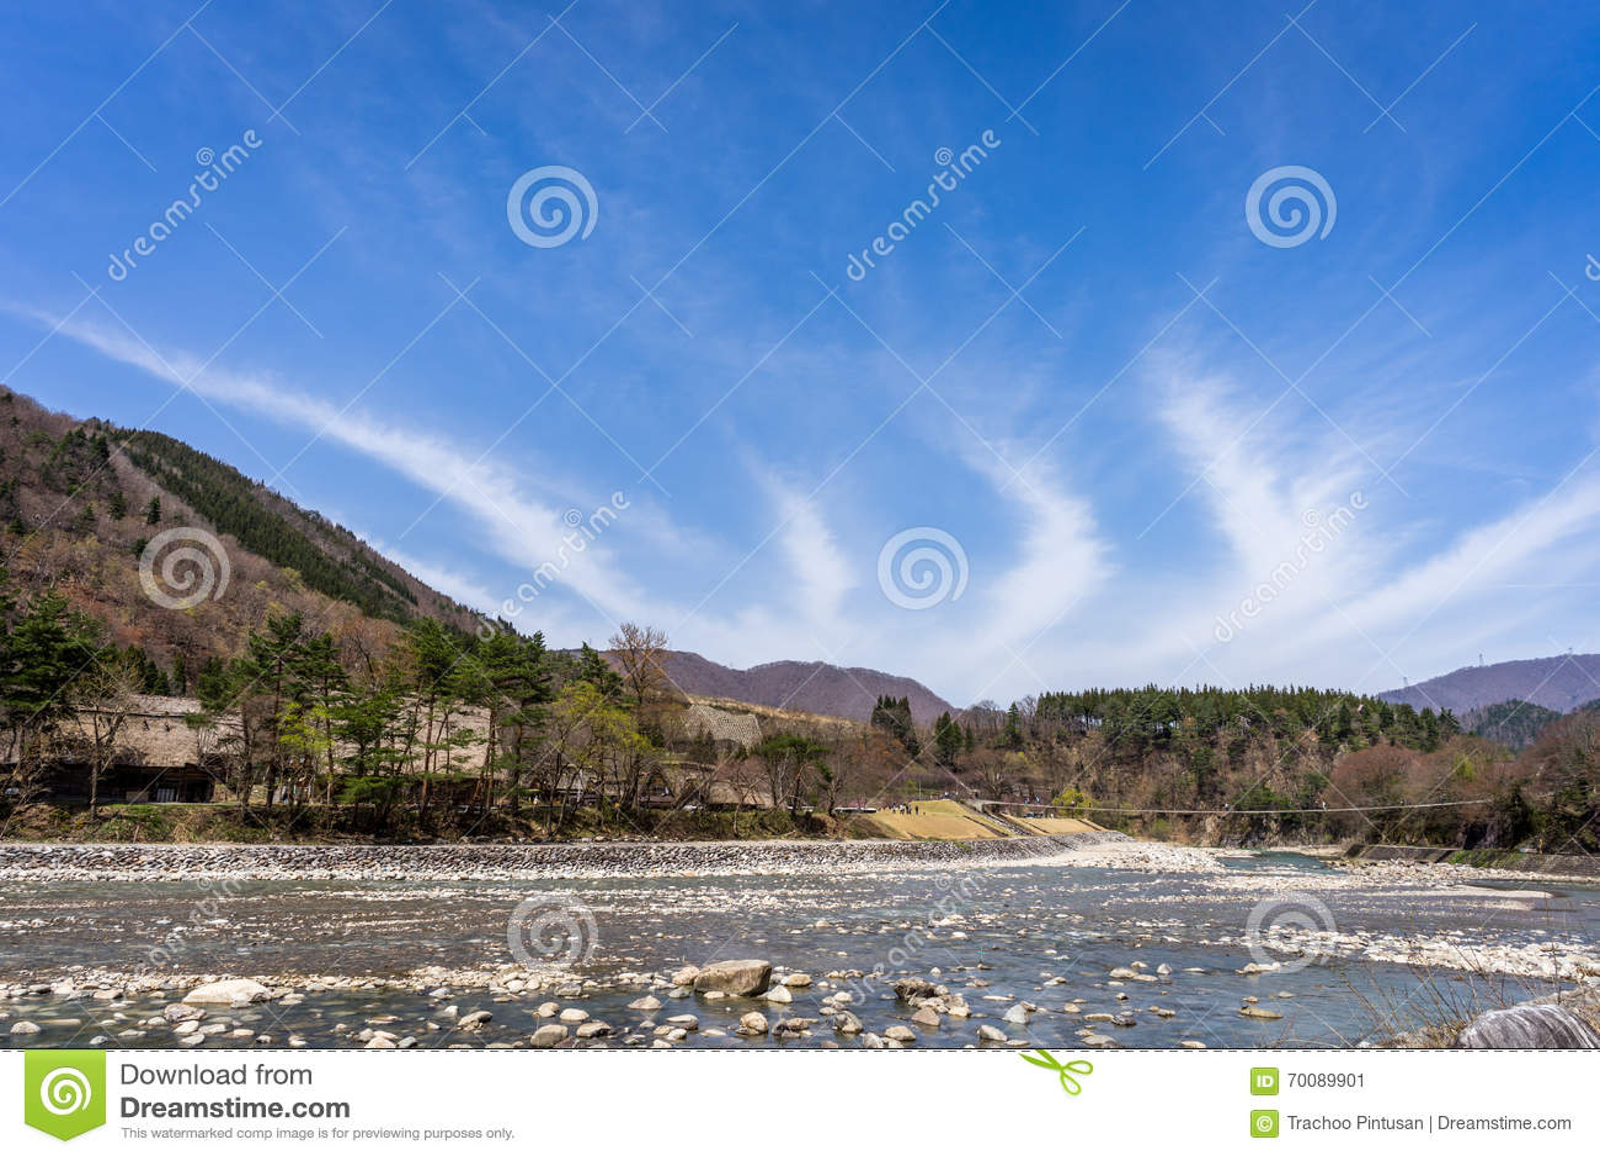 Small stream that runs through the side of Shirakawa-go